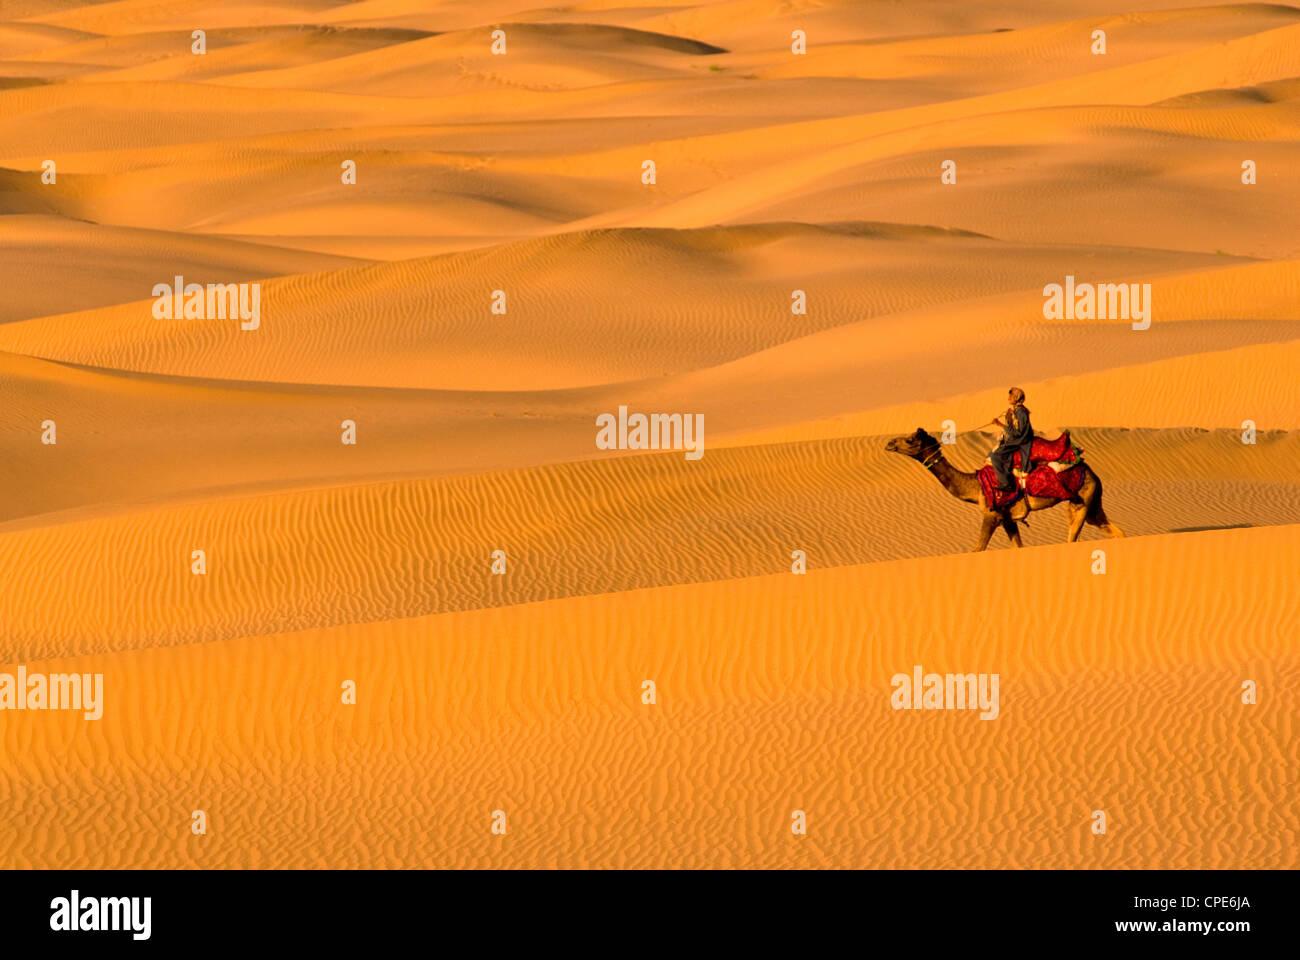 Sam Sand Dunes, Rajasthan, India, Asia - Stock Image